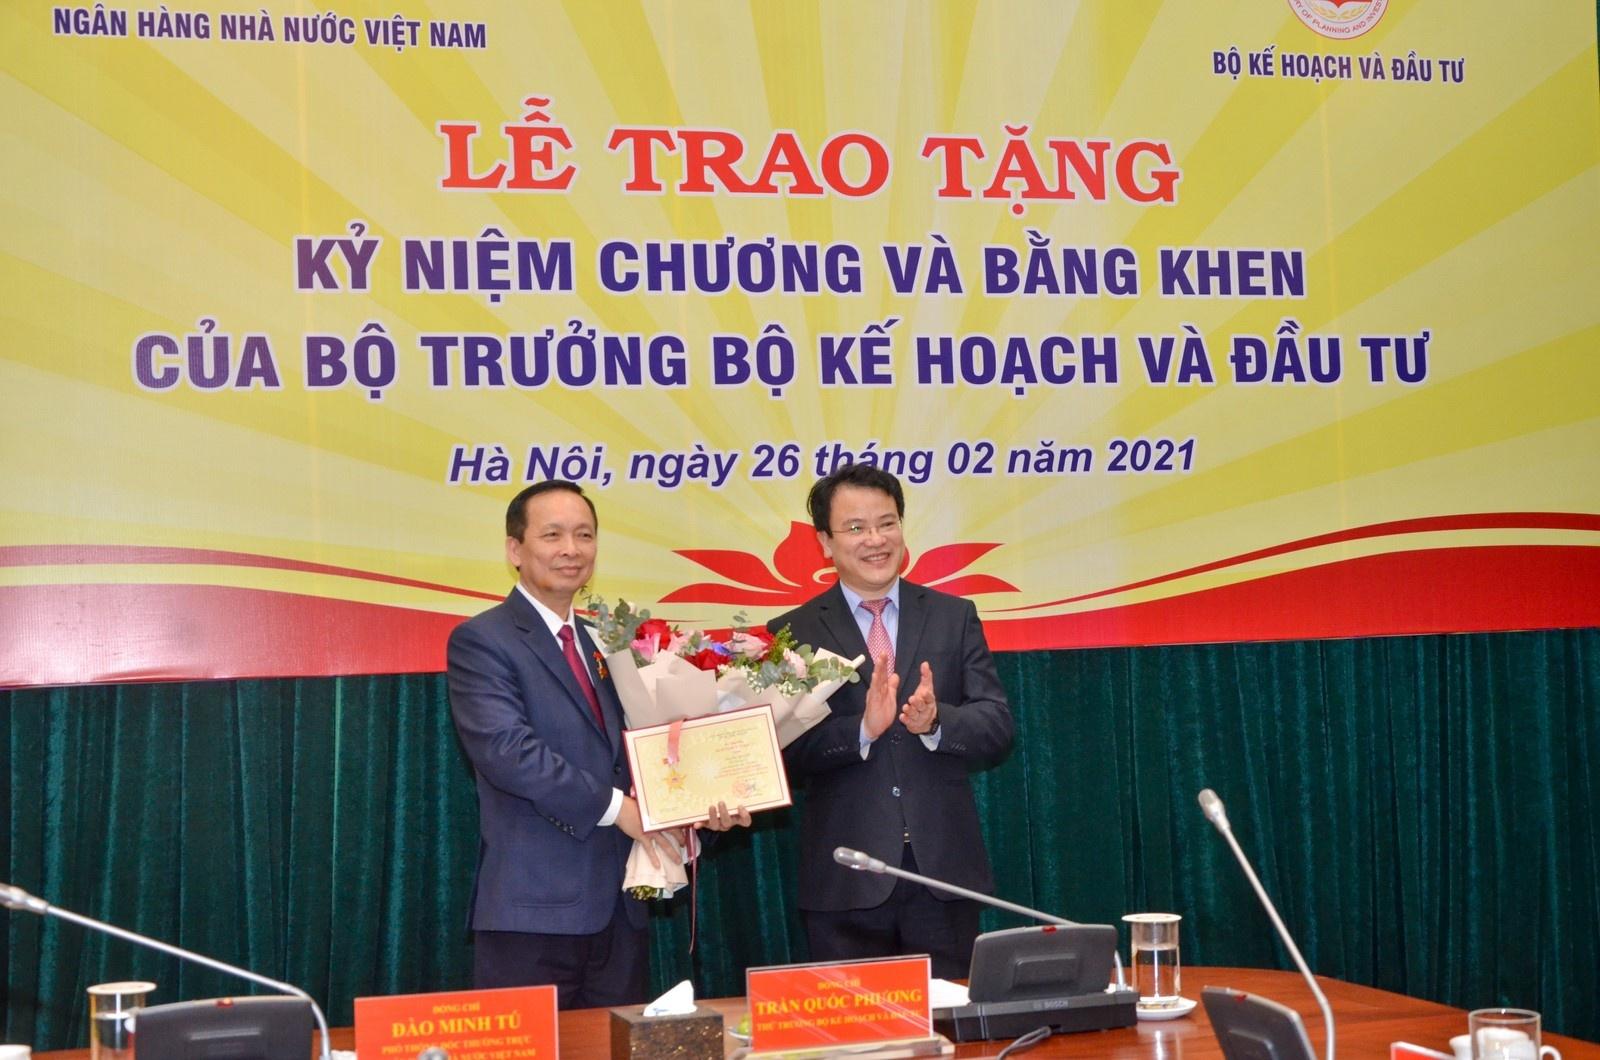 pho thong doc thuong truc dao minh tu vinh du nhan ky niem chuong vi su nghiep nganh ke hoach va dau tu